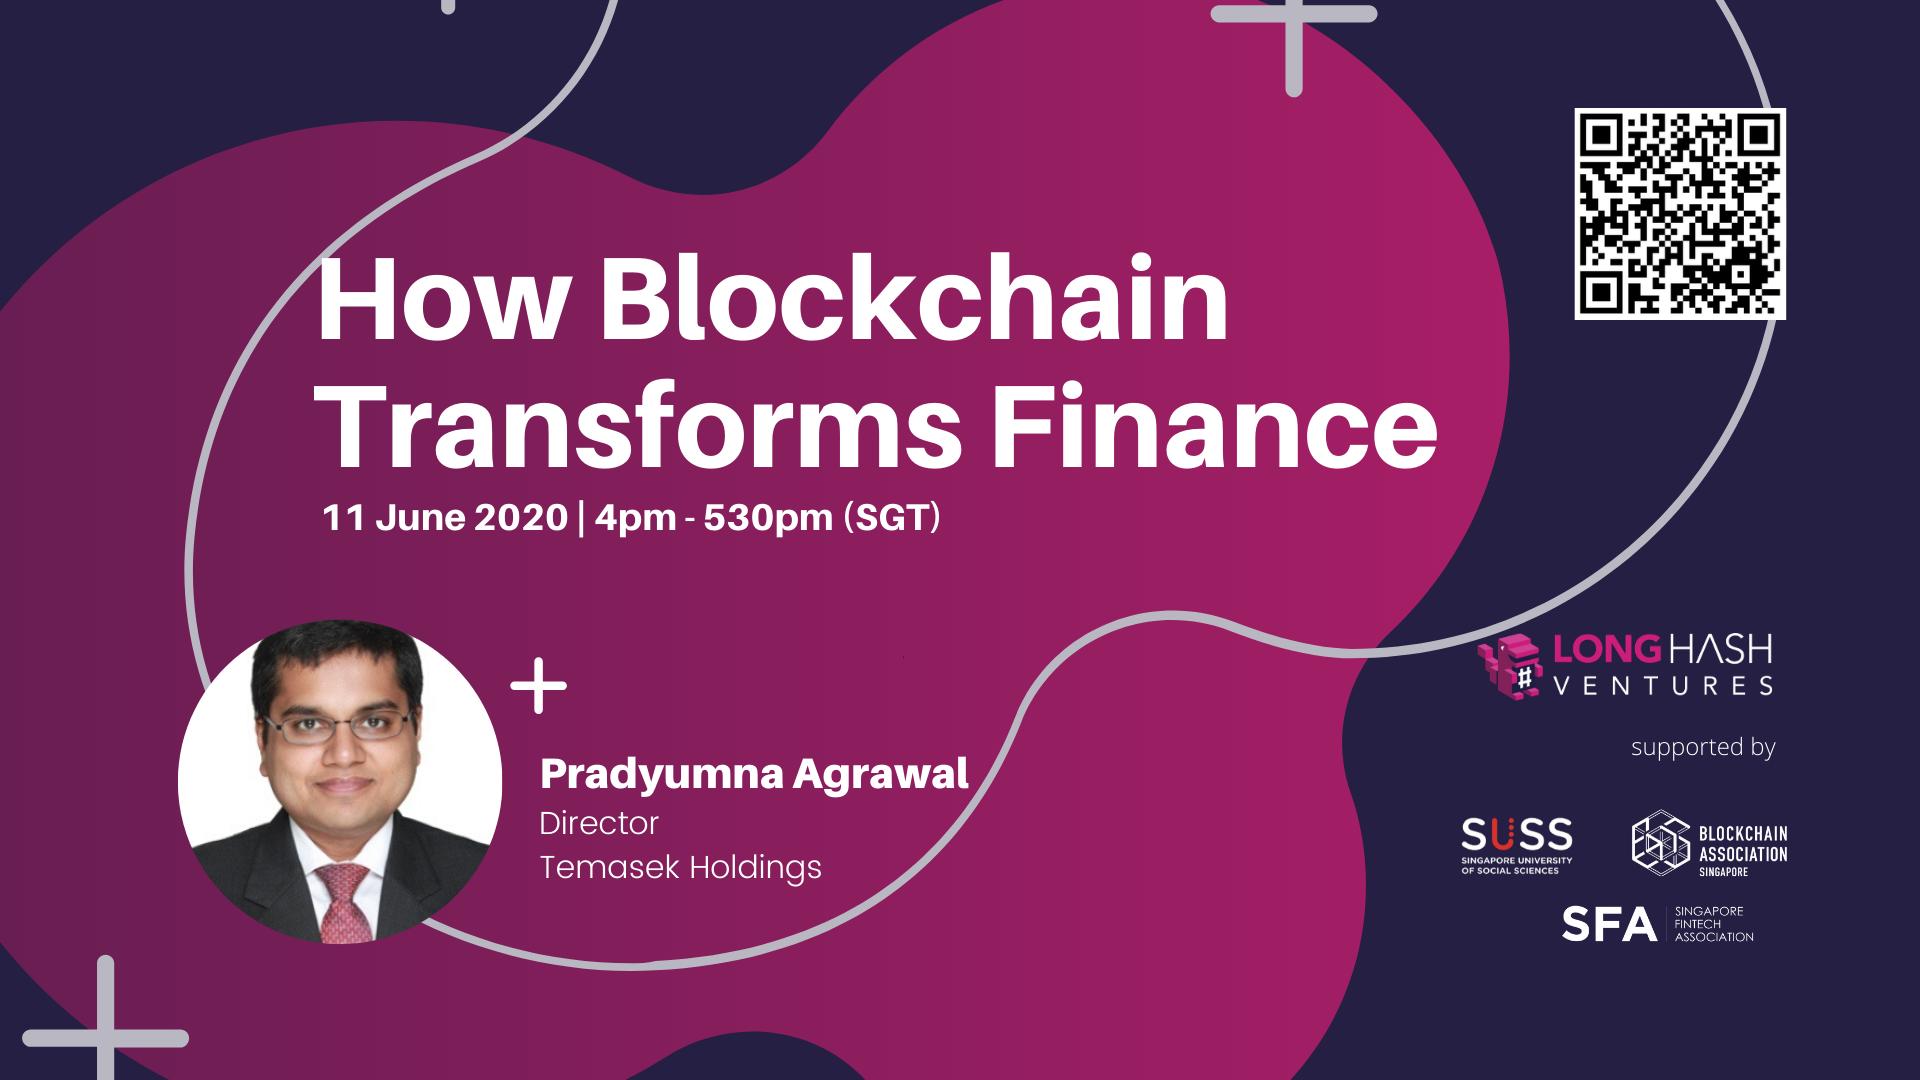 How Blockchain Transforms Finance with Pradyumna Agrawal